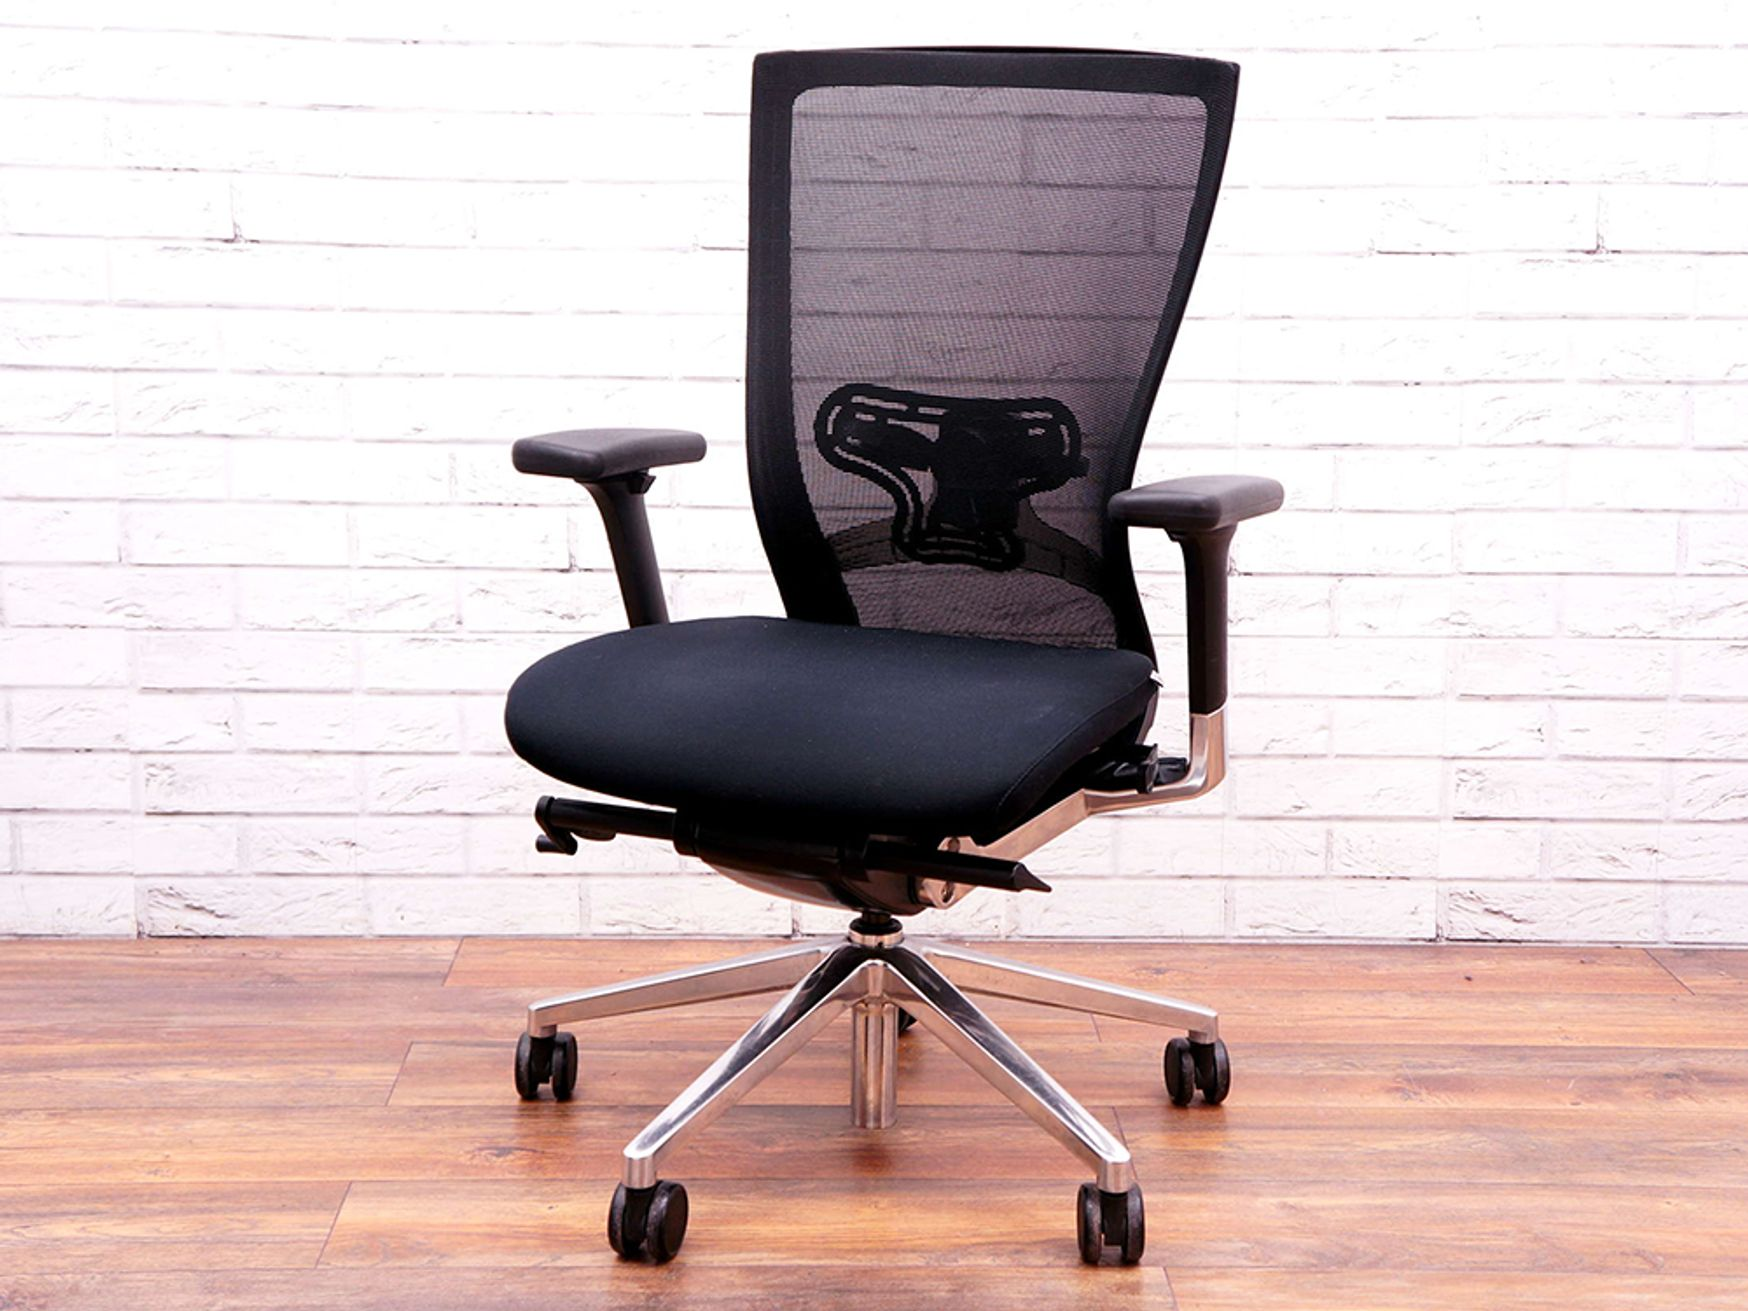 Used Techo Sidiz Mesh Operator Chairs with lumbar Support